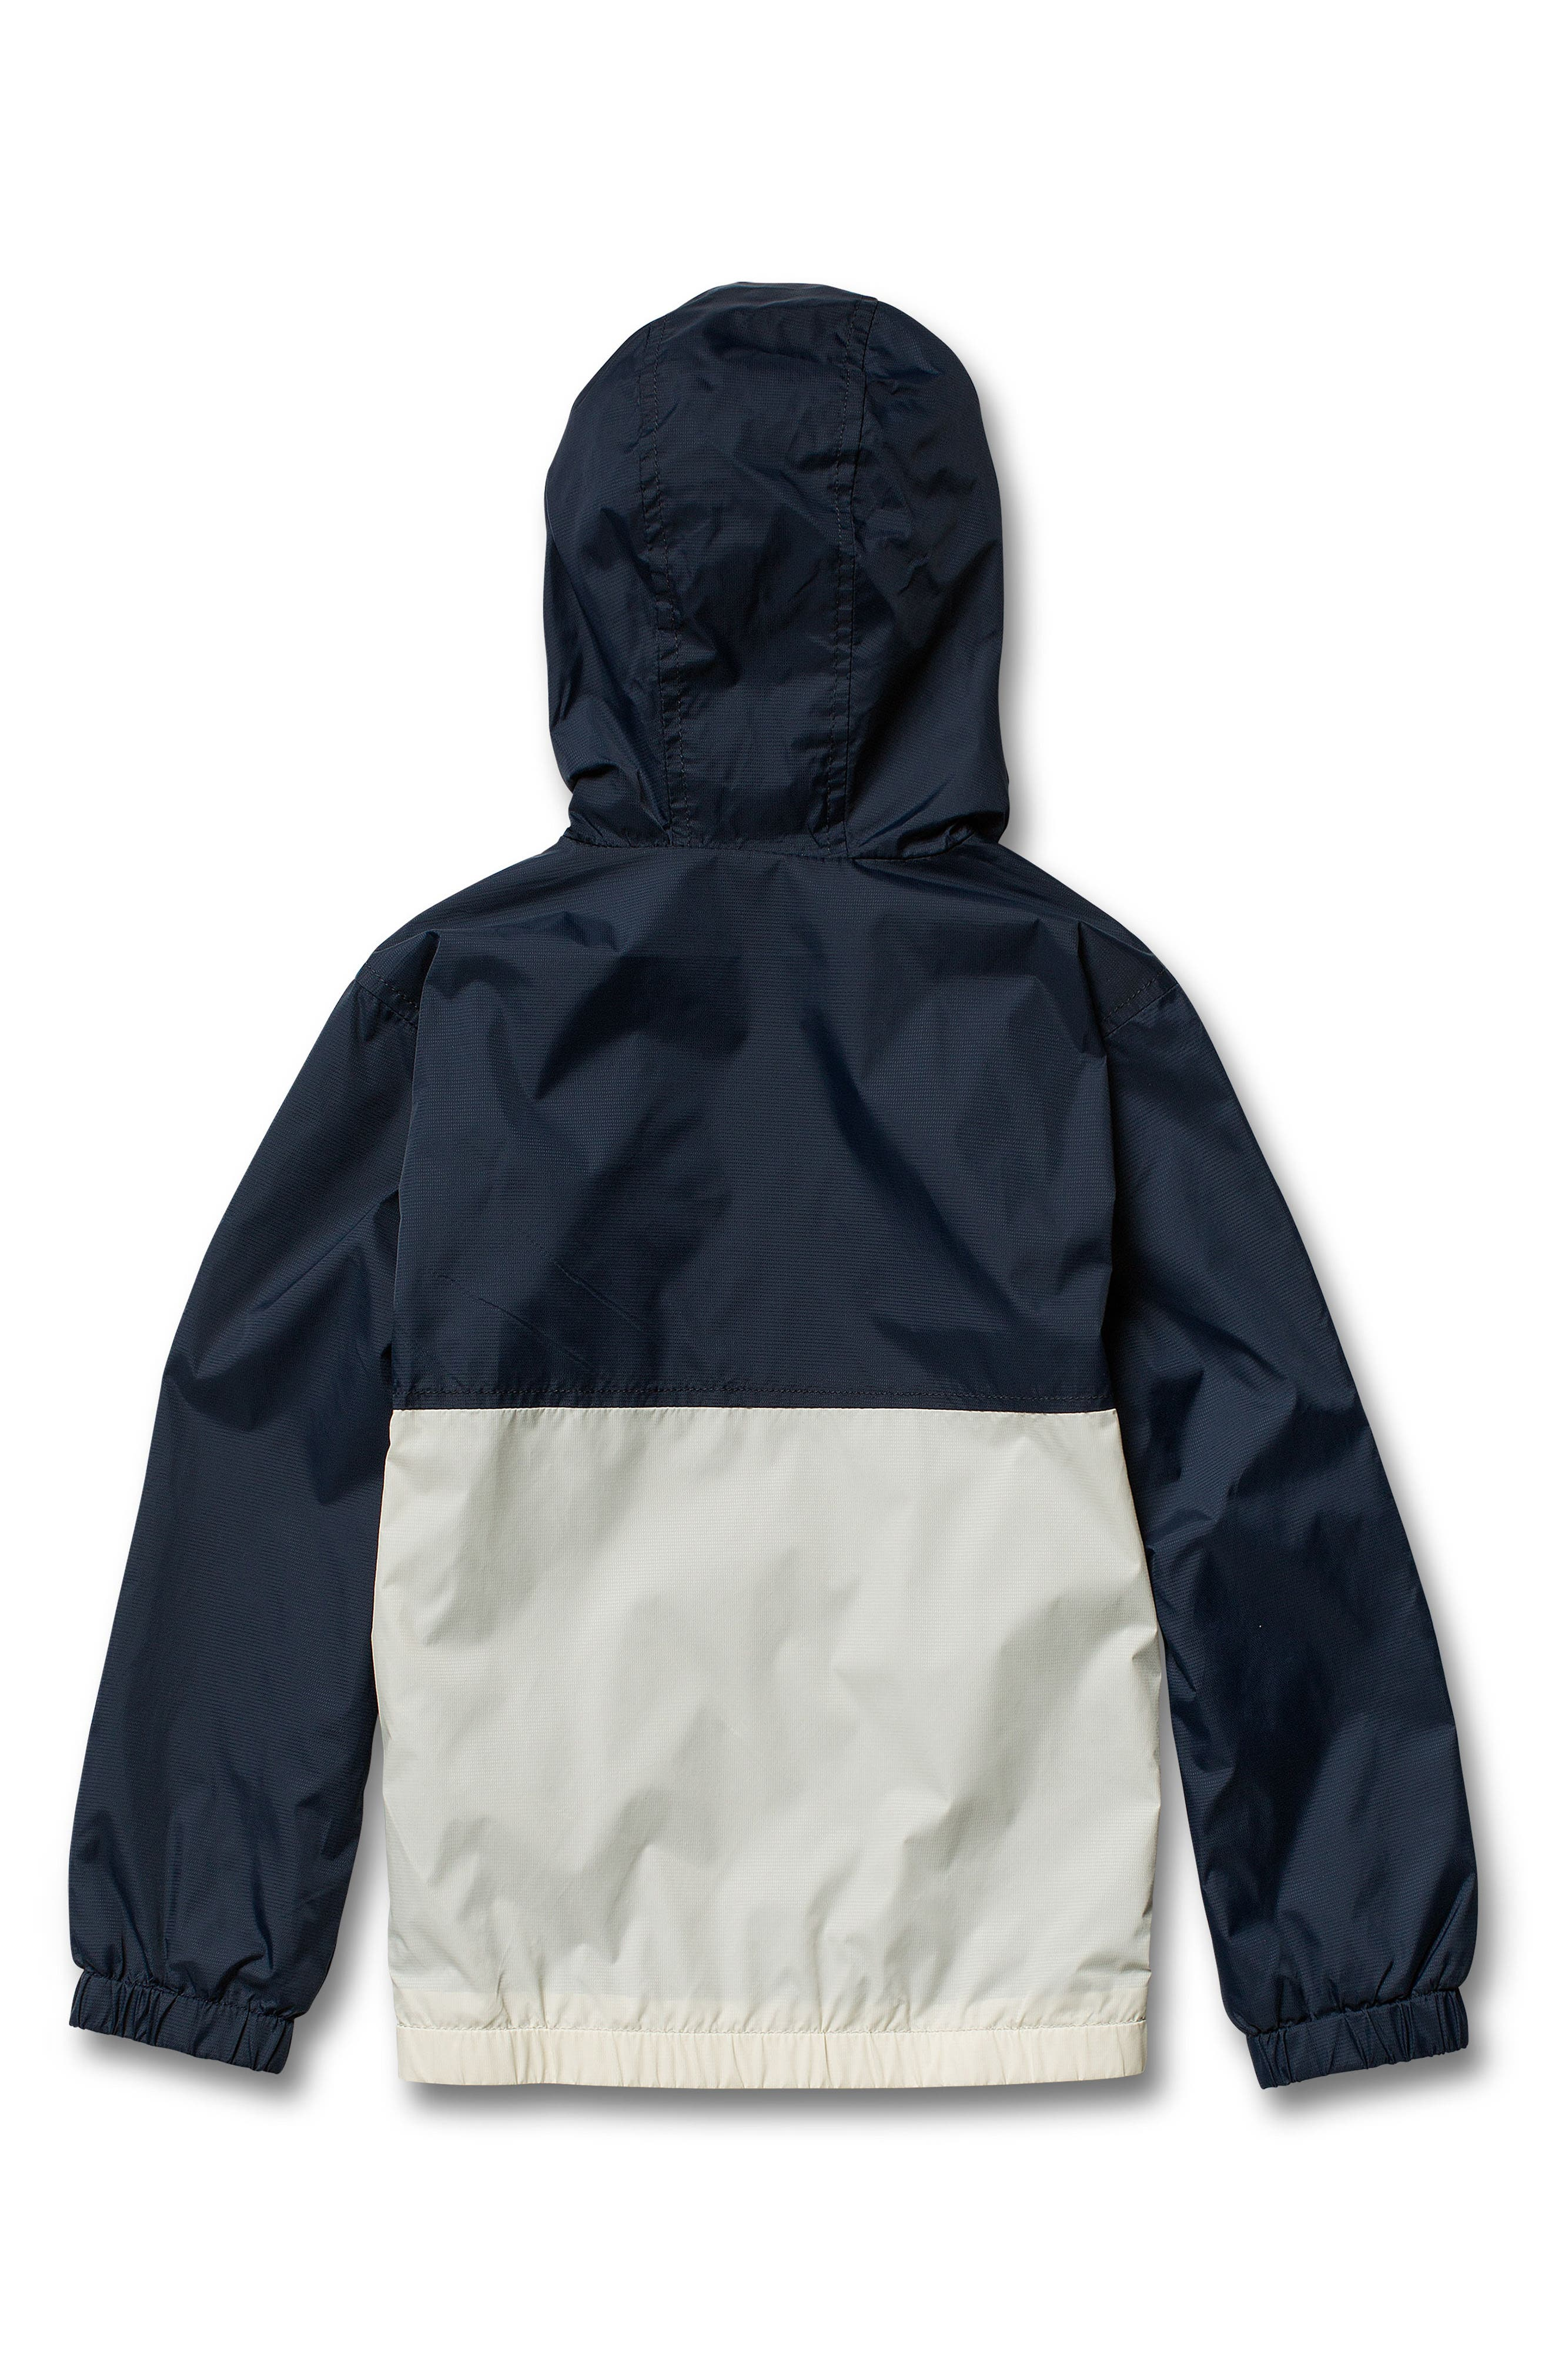 Ermont Hooded Nylon Jacket,                             Alternate thumbnail 2, color,                             MELINDIGO